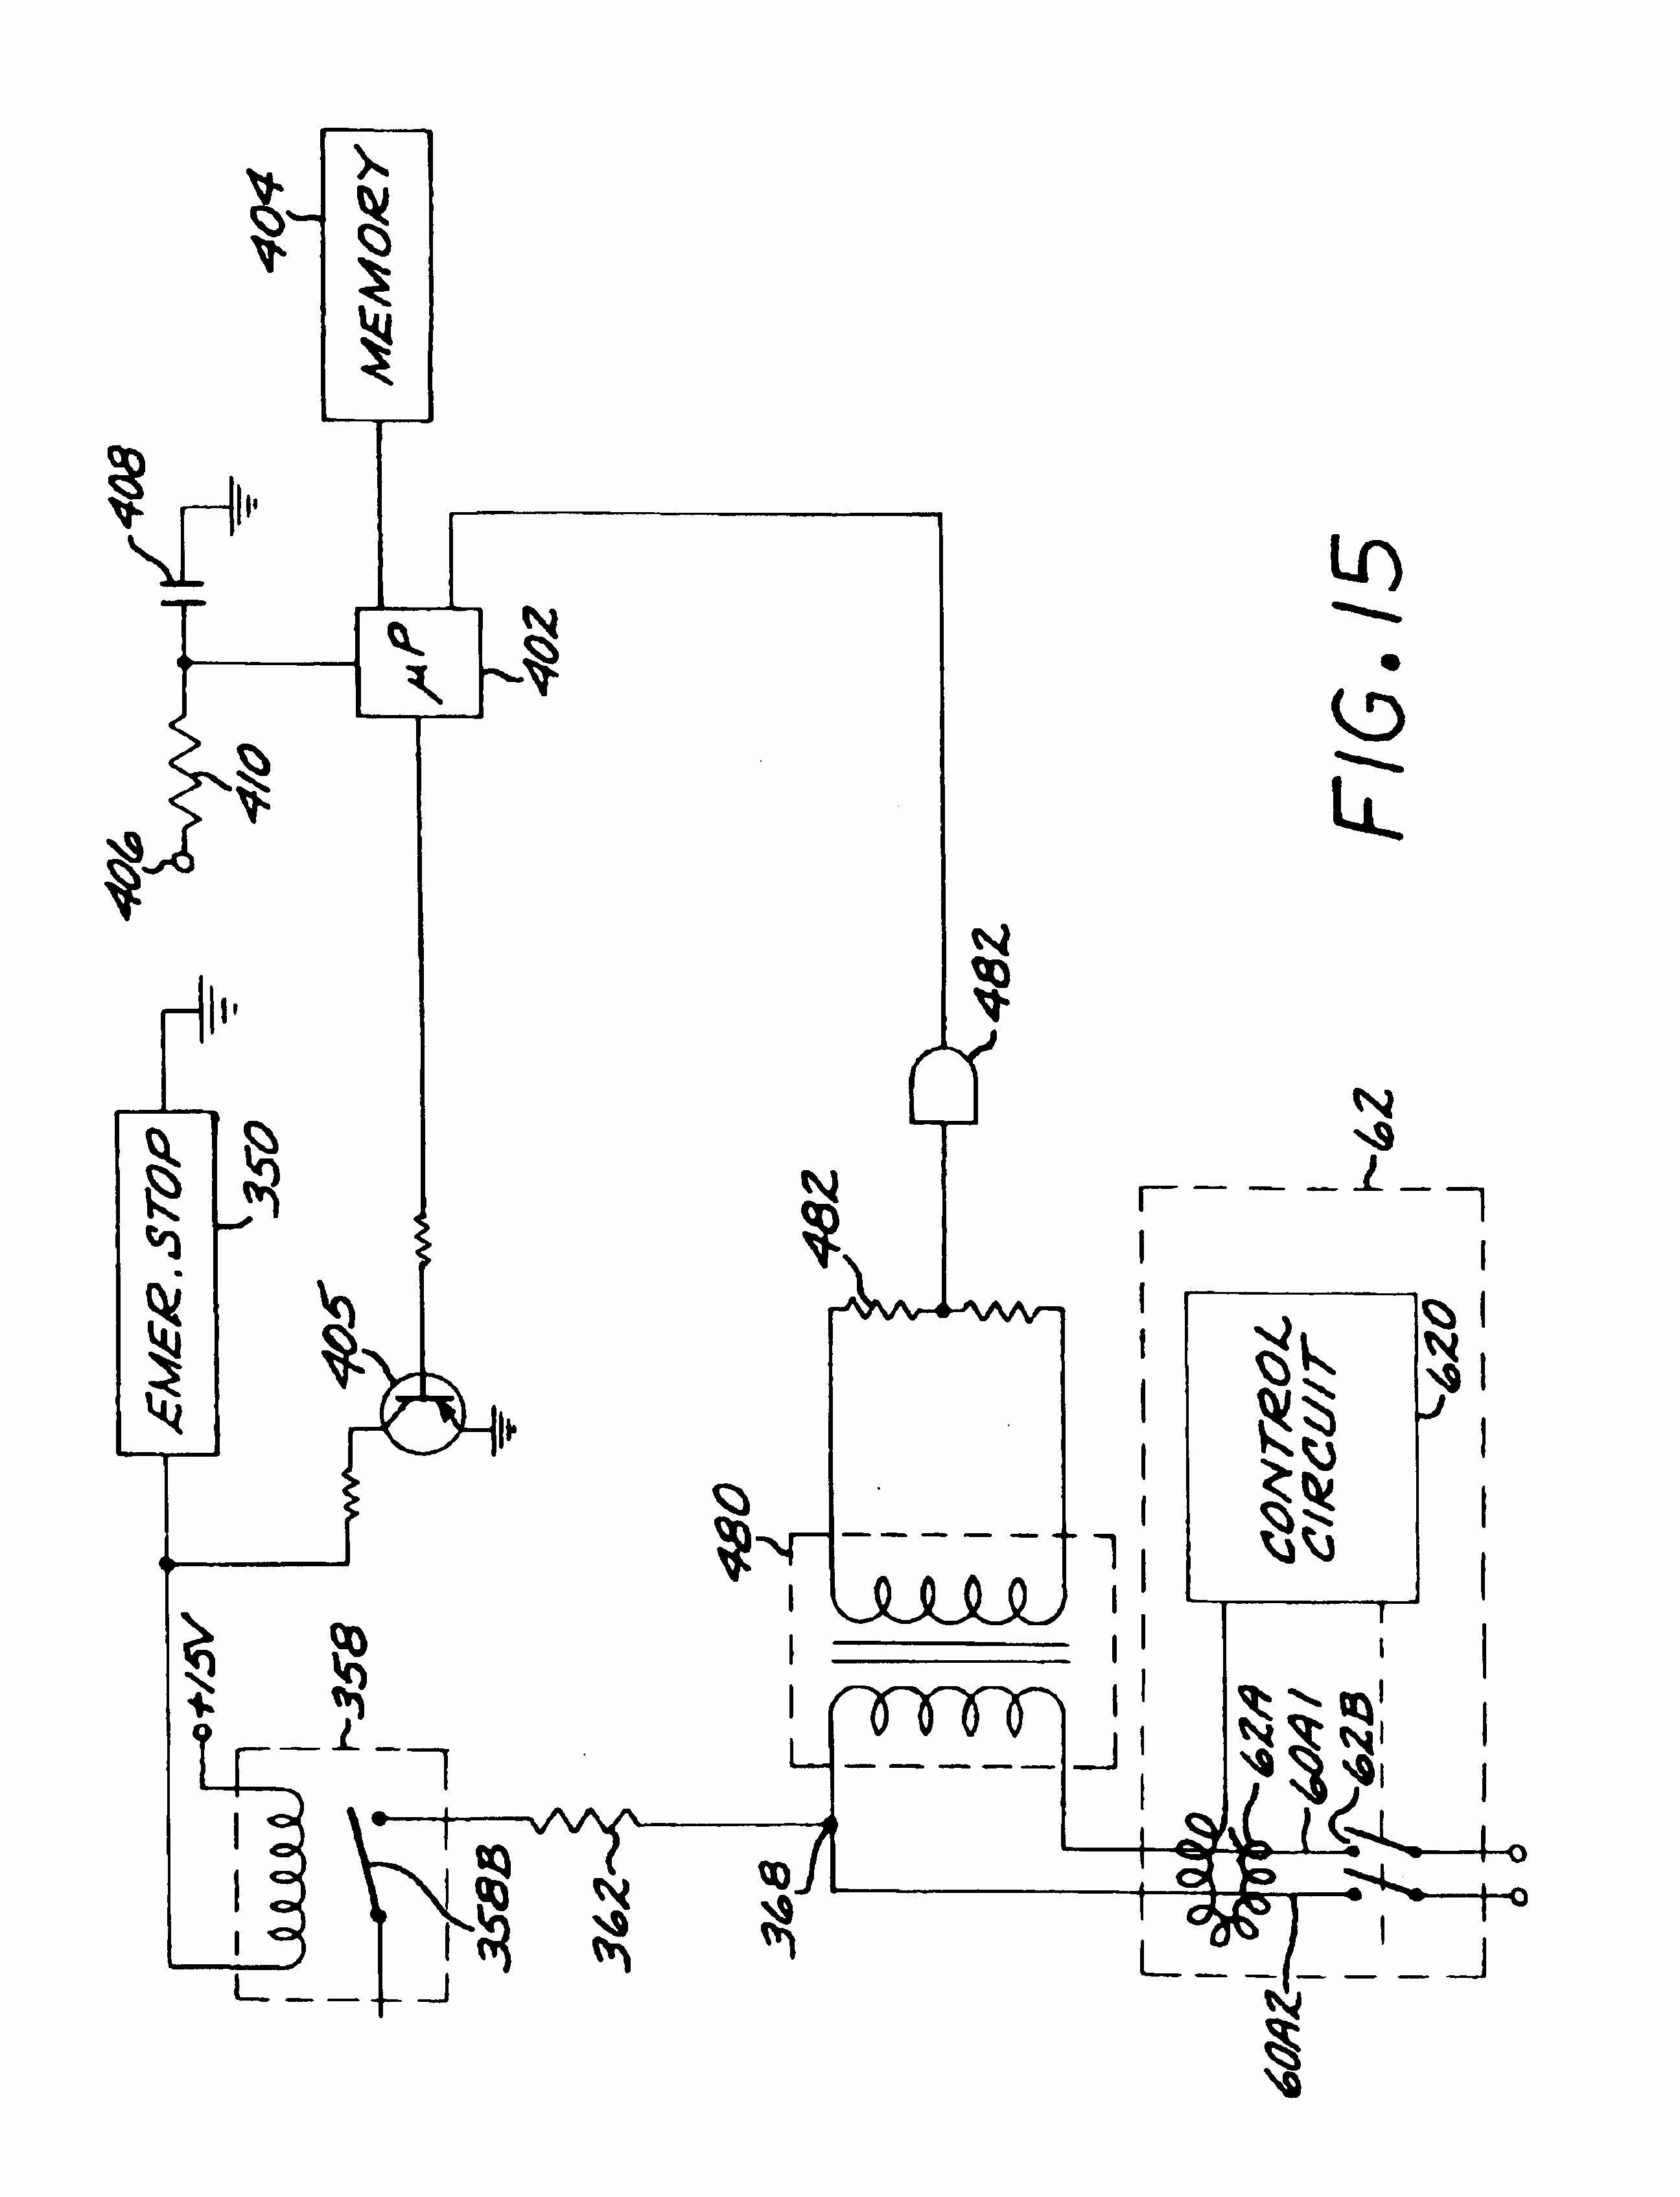 Pool Pump Wiring Diagram In 2020 Jet Pump Pool Pump Diagram